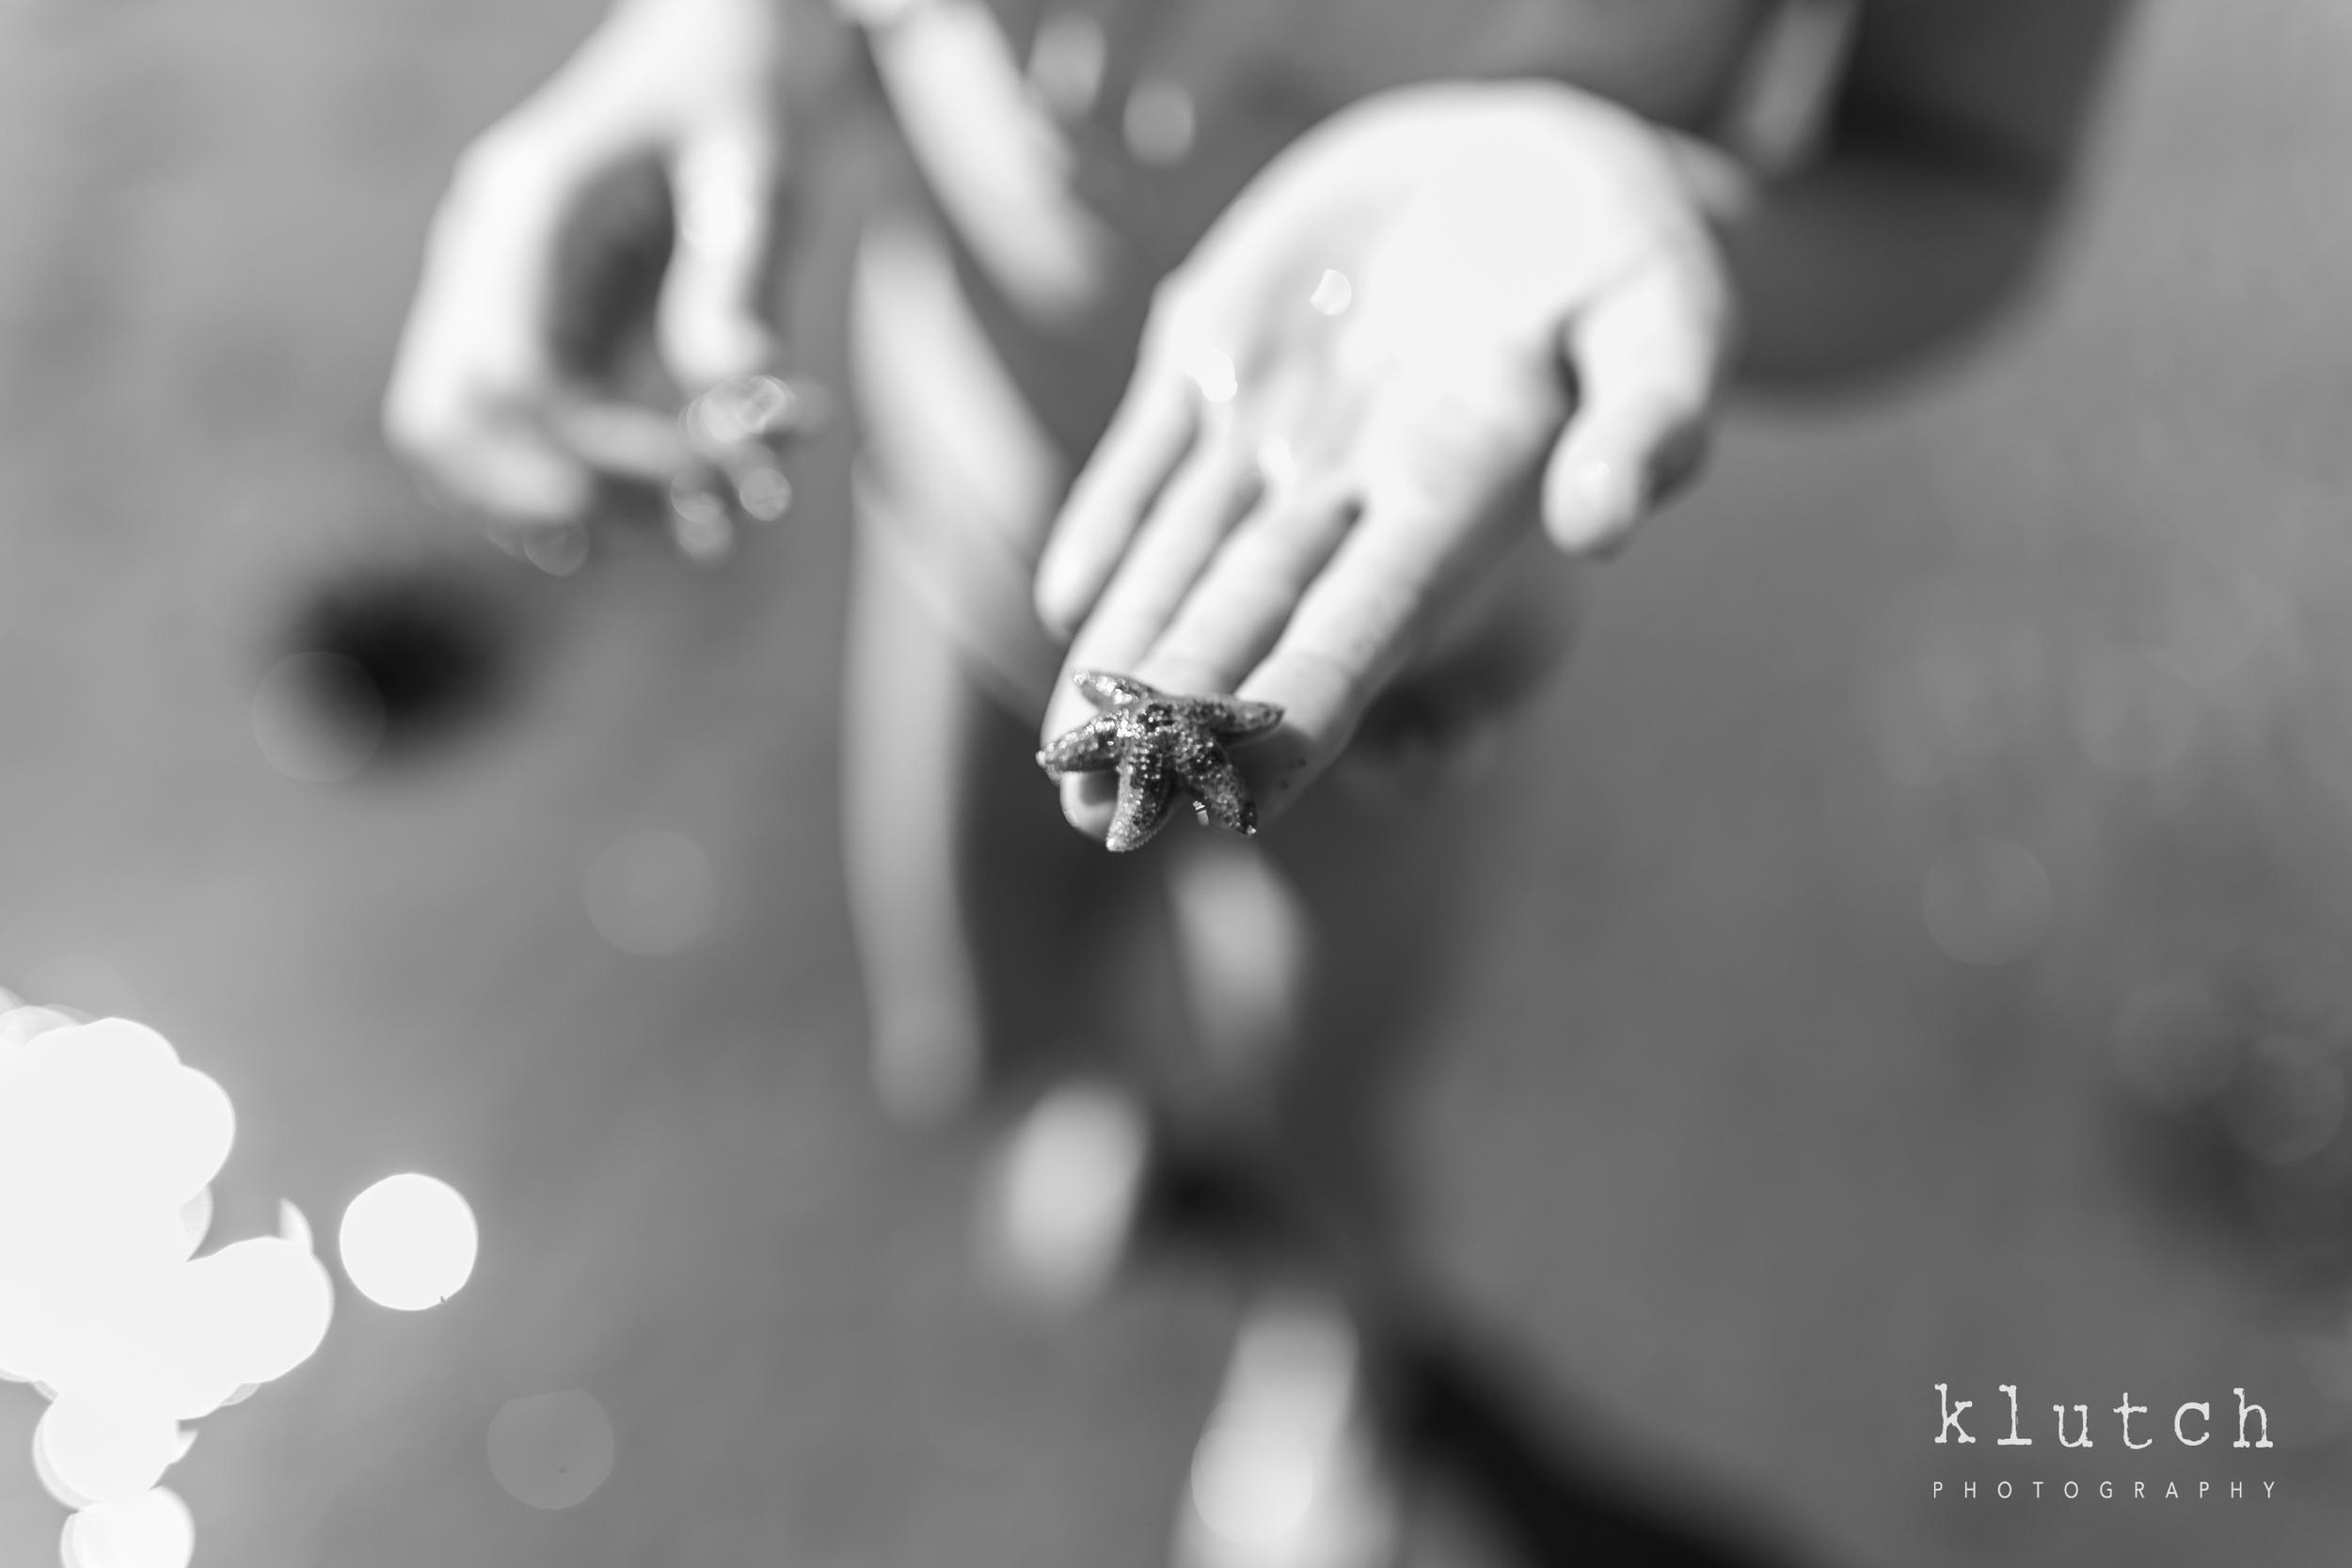 Klutch Photography,white rock family photographer, vancouver family photographer, whiterock lifestyle photographer, life unscripted photographer, life unscripted session, photography,Dina Ferreira Stoddard-5610.jpg